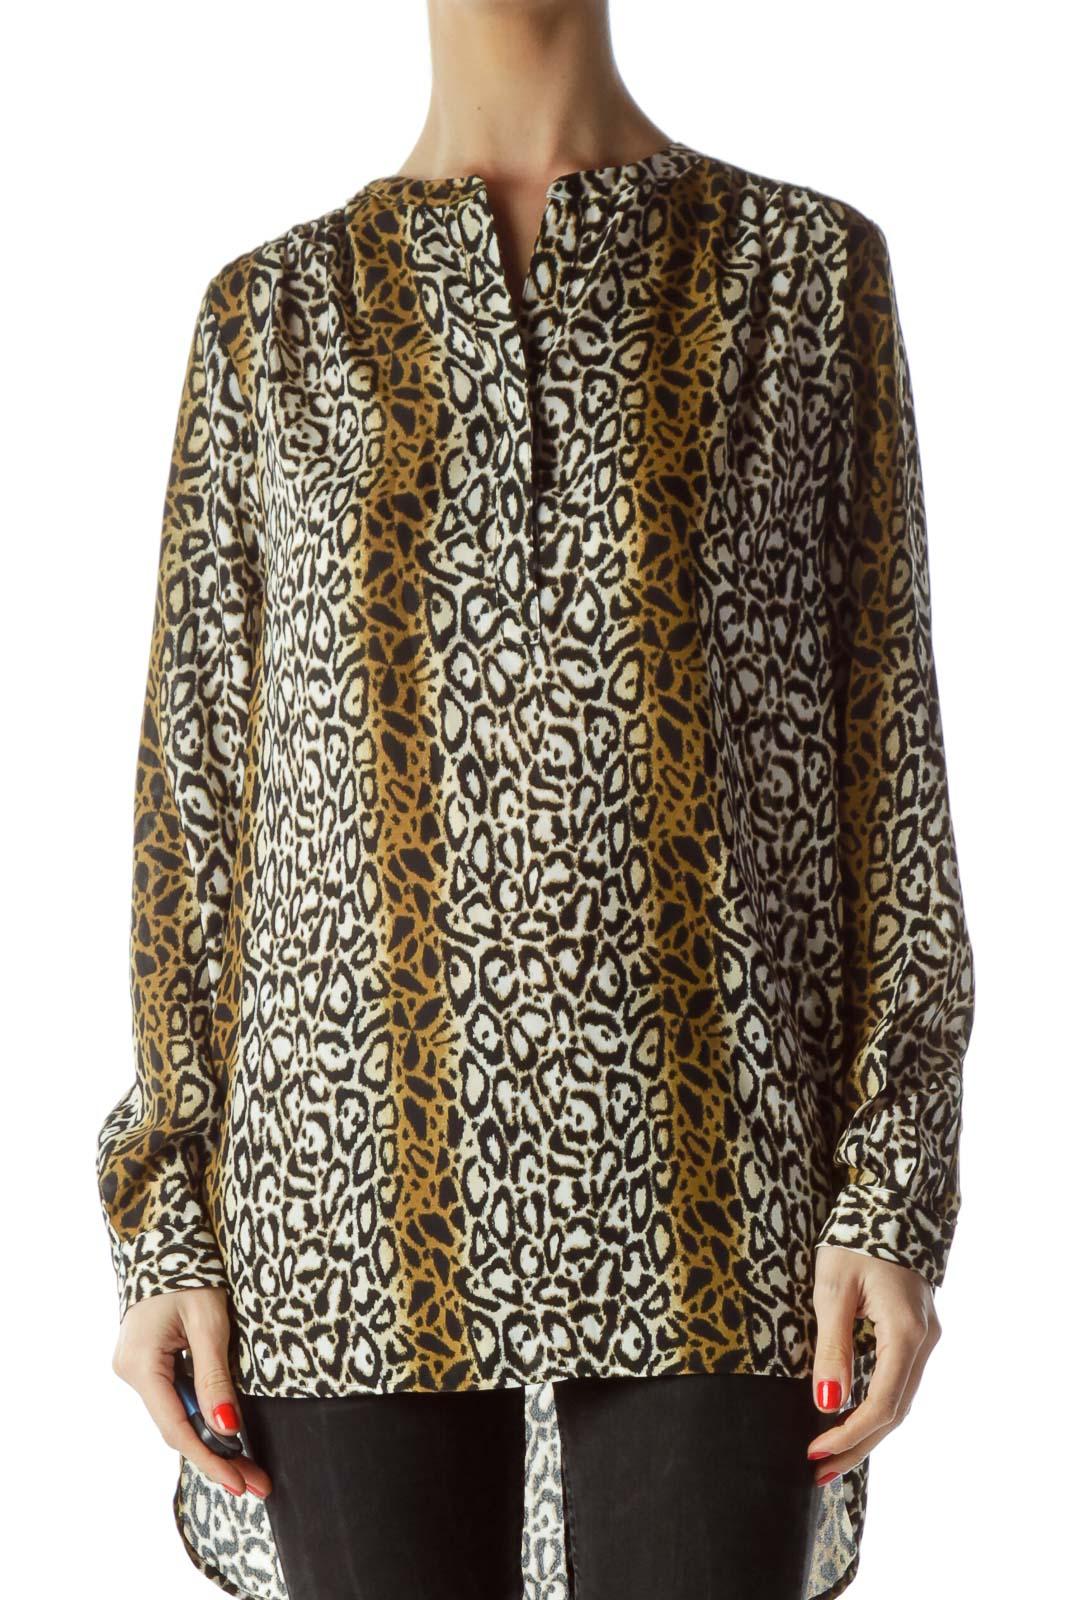 Black Brown Cream Animal Print Shift Shirt Front